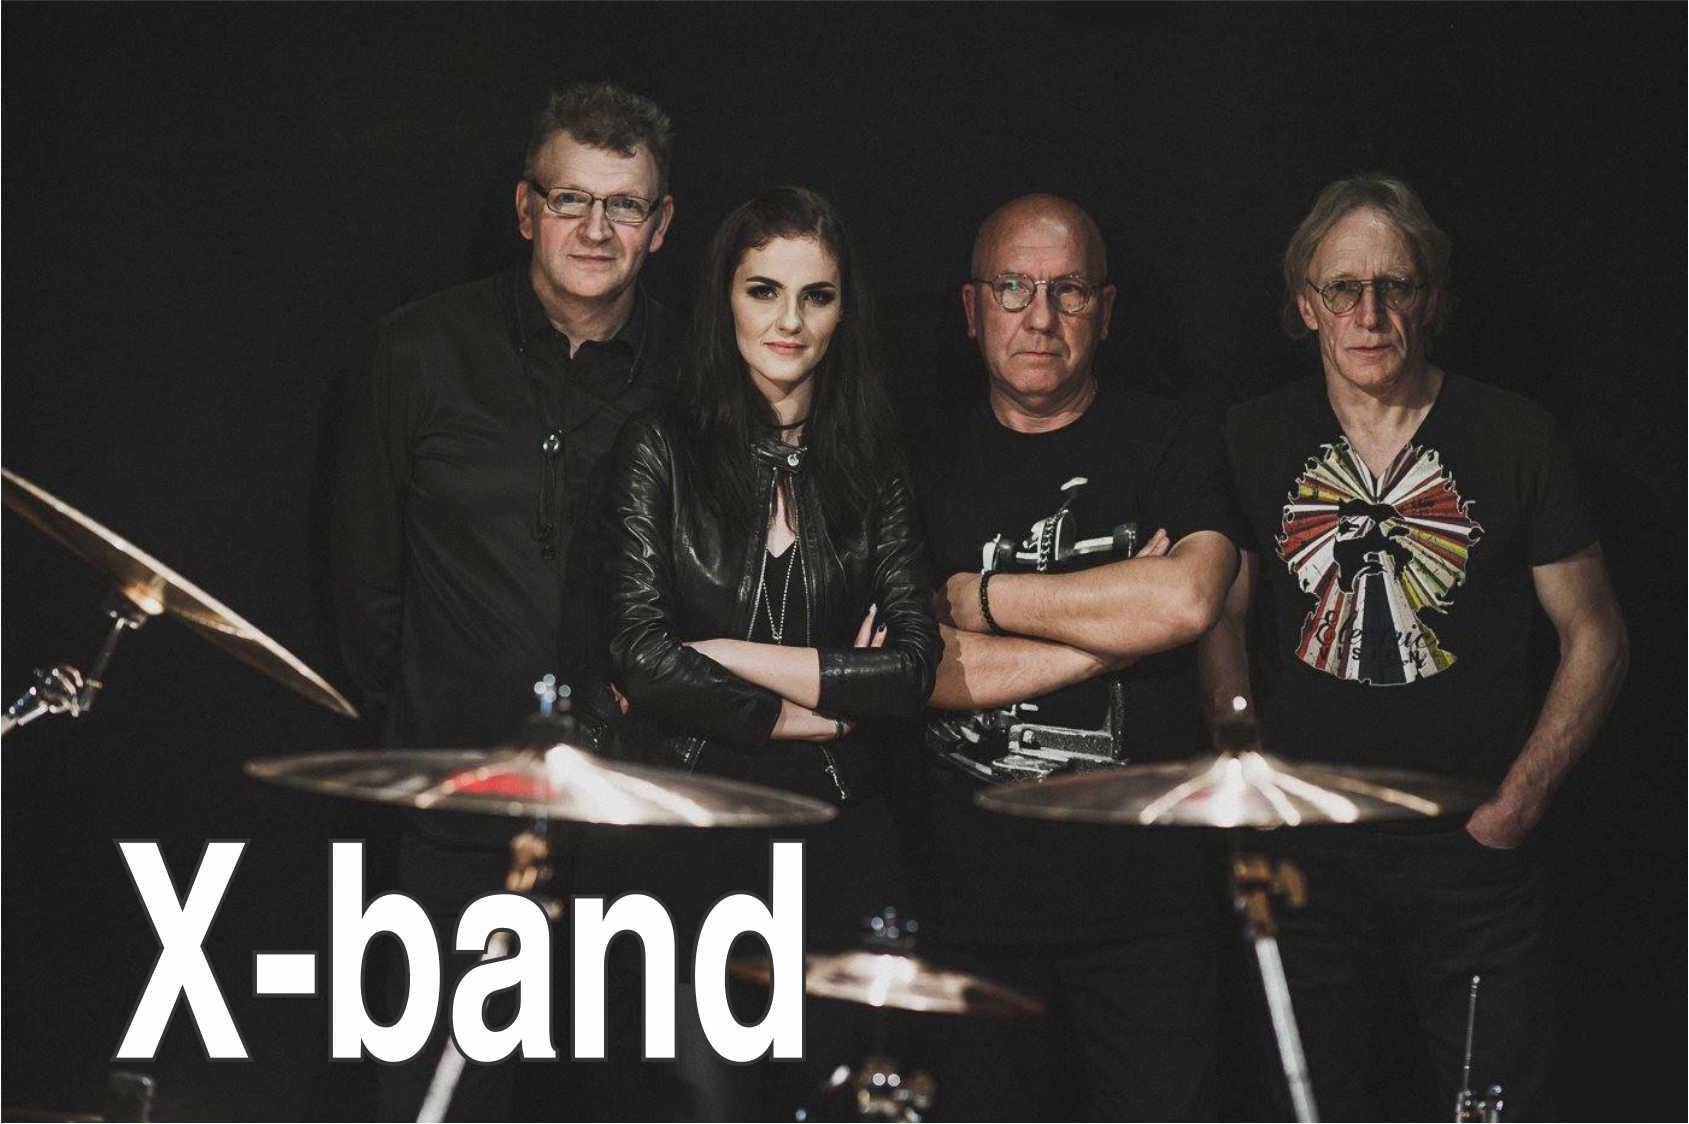 http://laisvadiena.lt/upload/7105_Groja-gyvos-muzikos-grupe-X-BAND.jpg